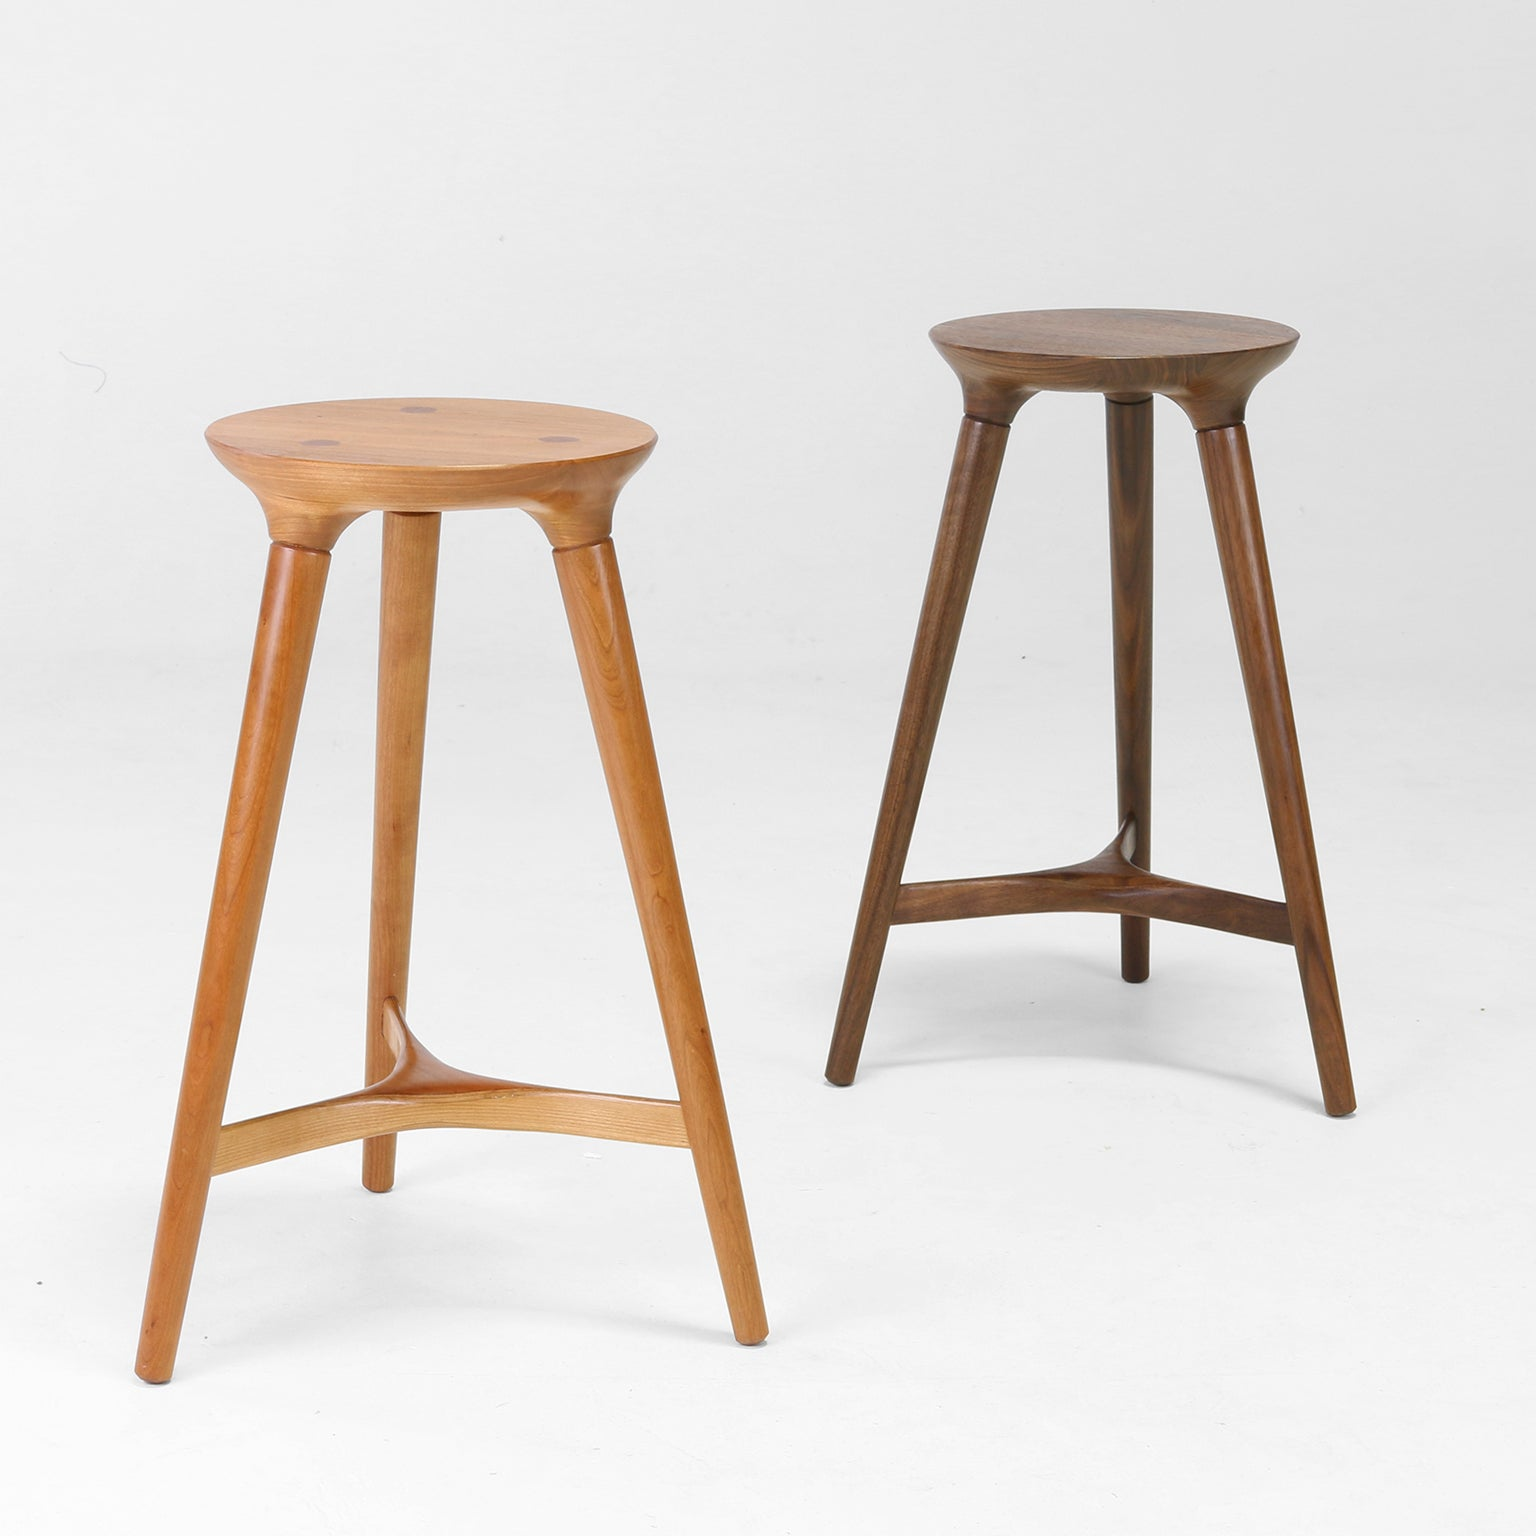 Kingstown Counter Stools, Scandinavian Inspired Design By Studio Dunn For Sale